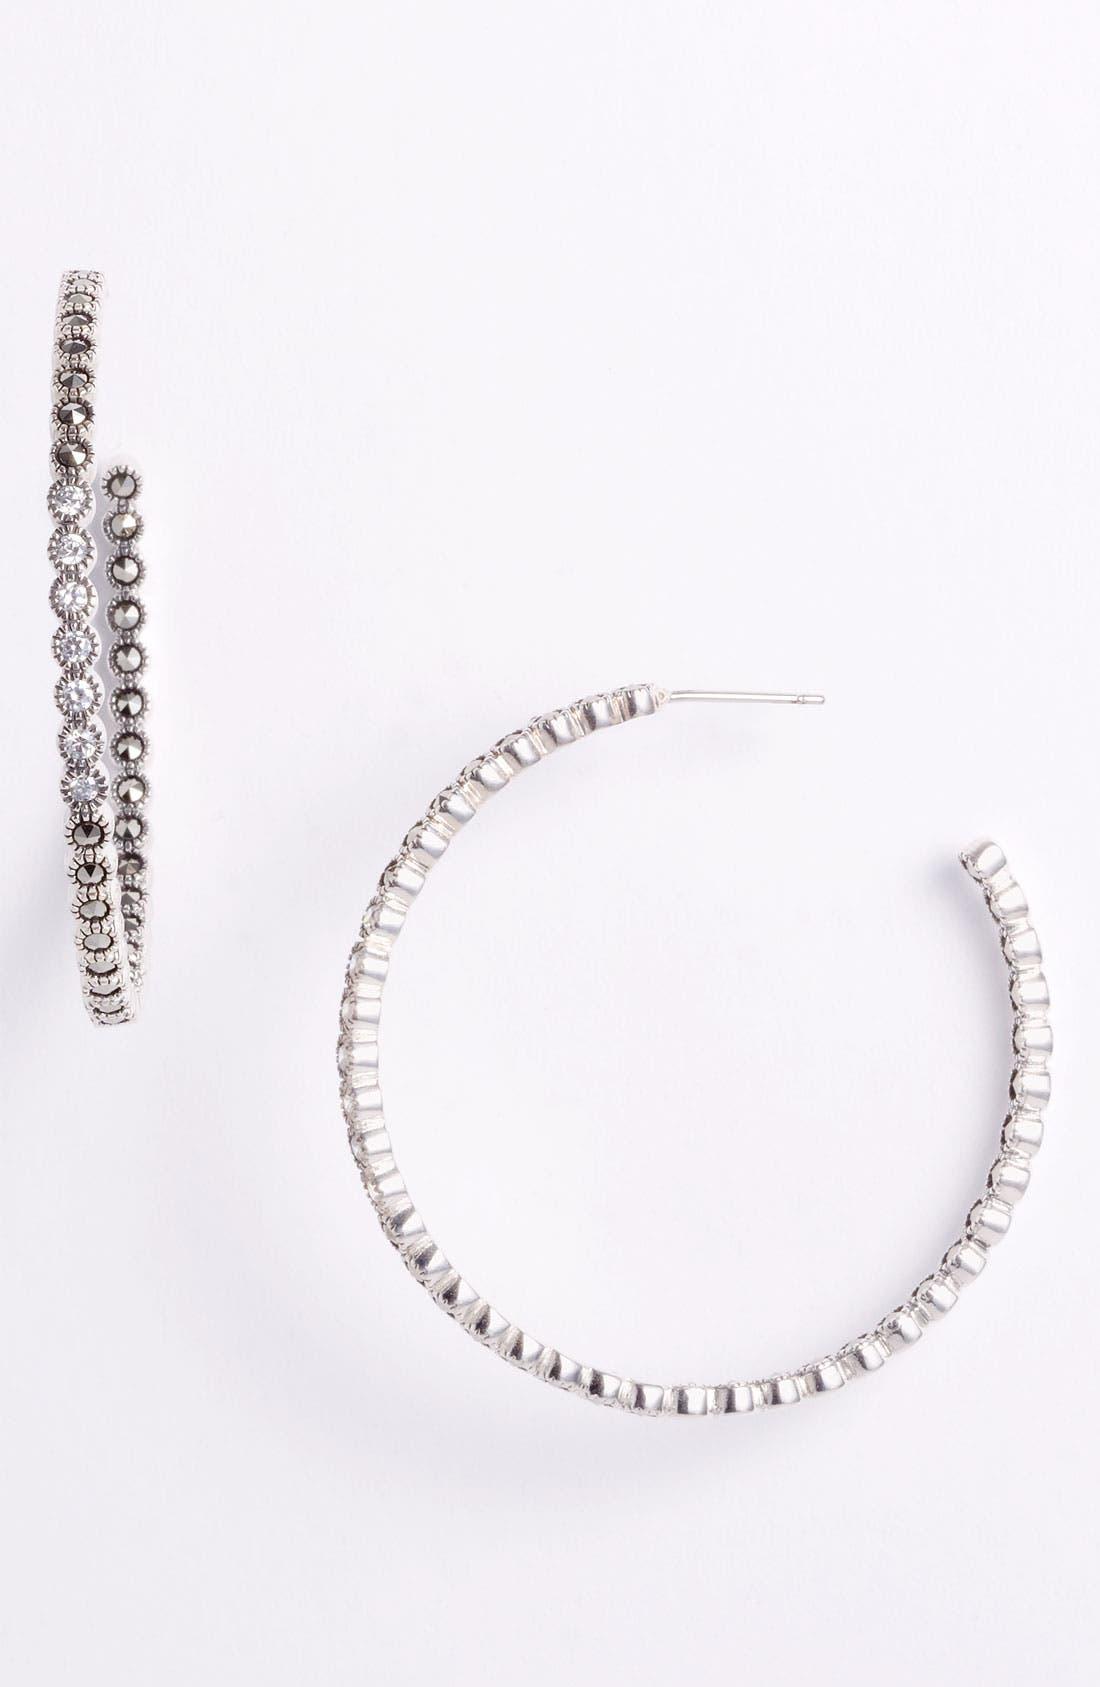 Alternate Image 1 Selected - Judith Jack 'Starlight' Inside Out Hoop Earrings